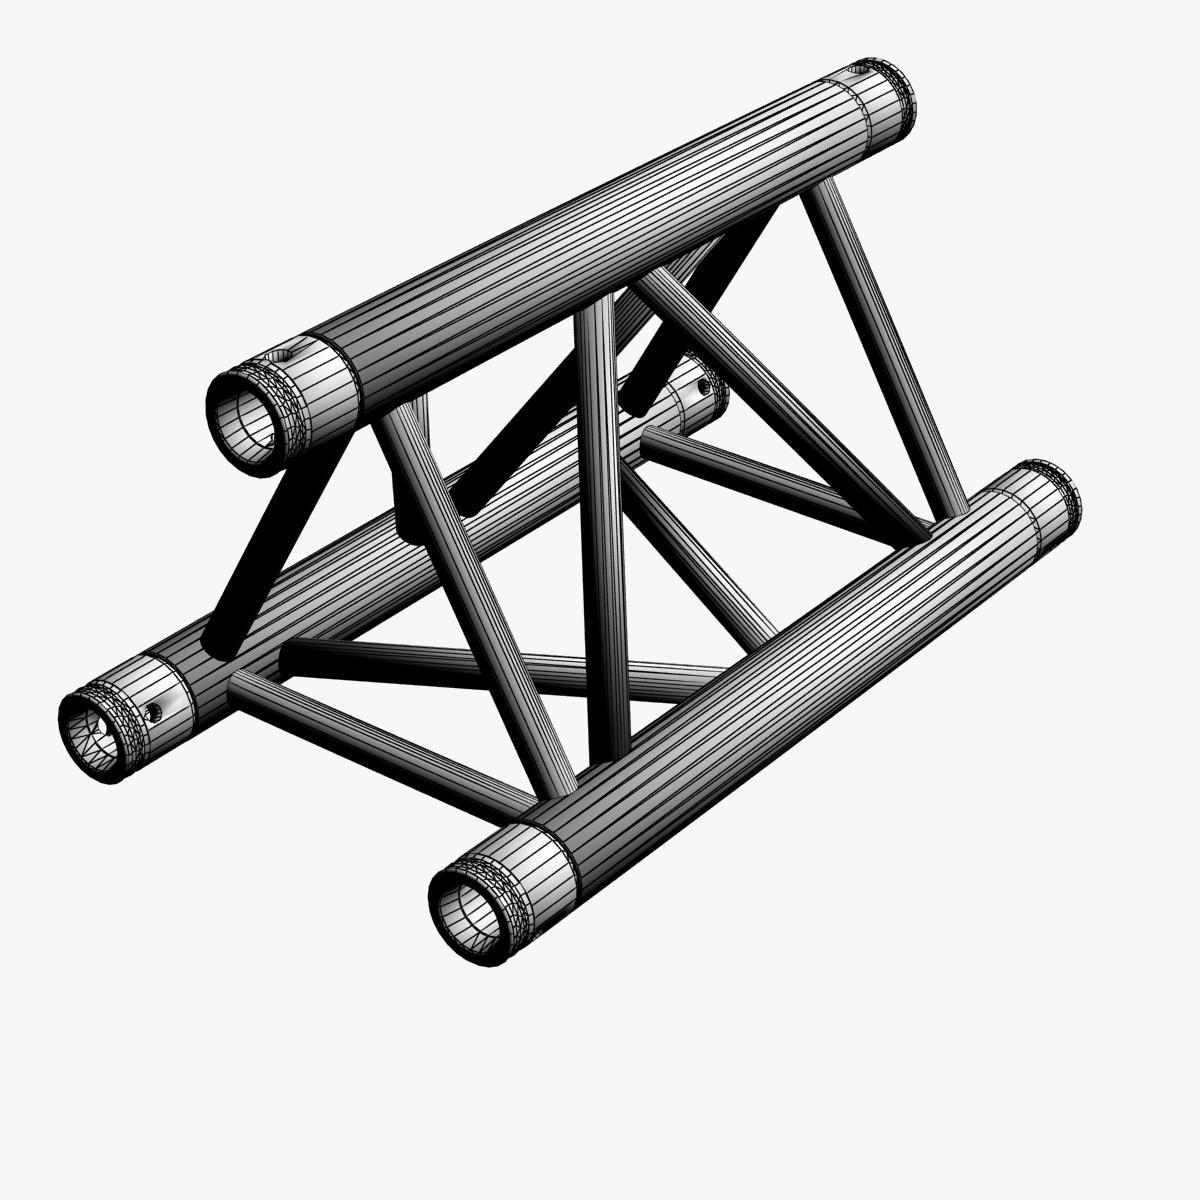 triangular trusses (collection 55 modular pieces) 3d model 3ds max dxf fbx c4d dae texture obj 216215